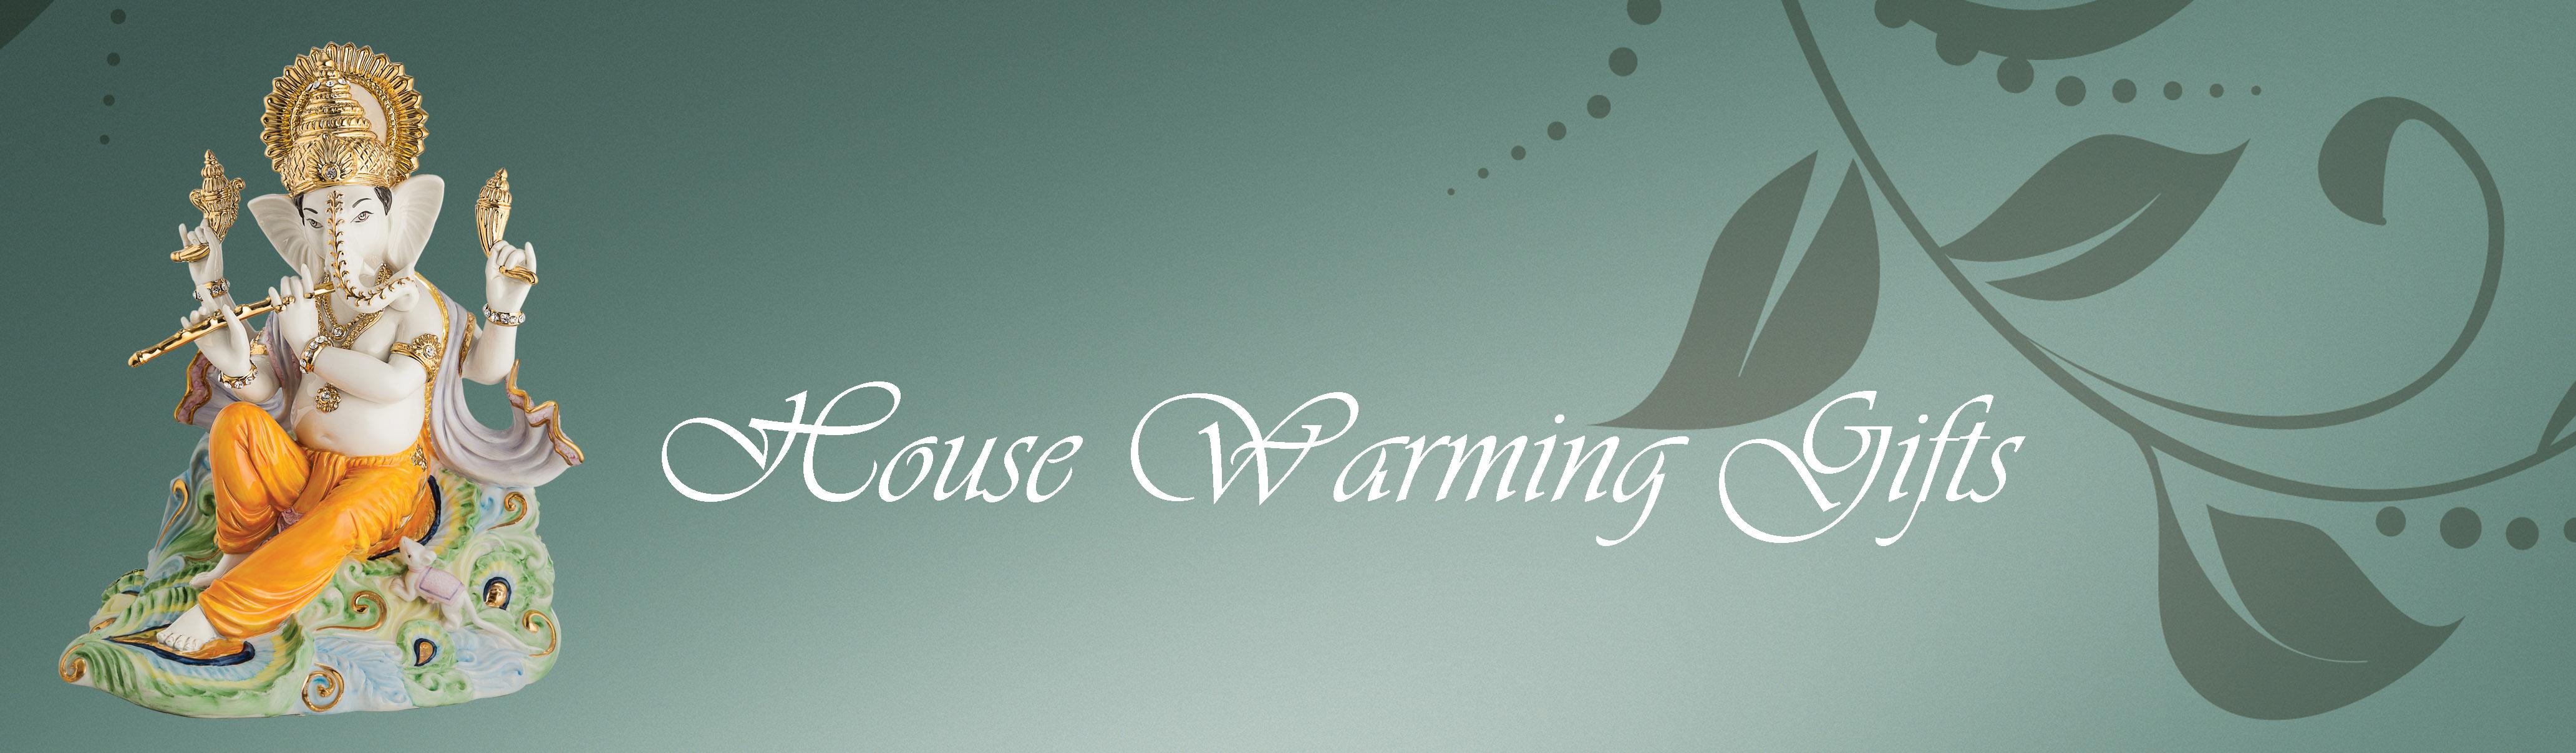 Indian Housewarming Gifts: Housewarming Gifts Ideas India